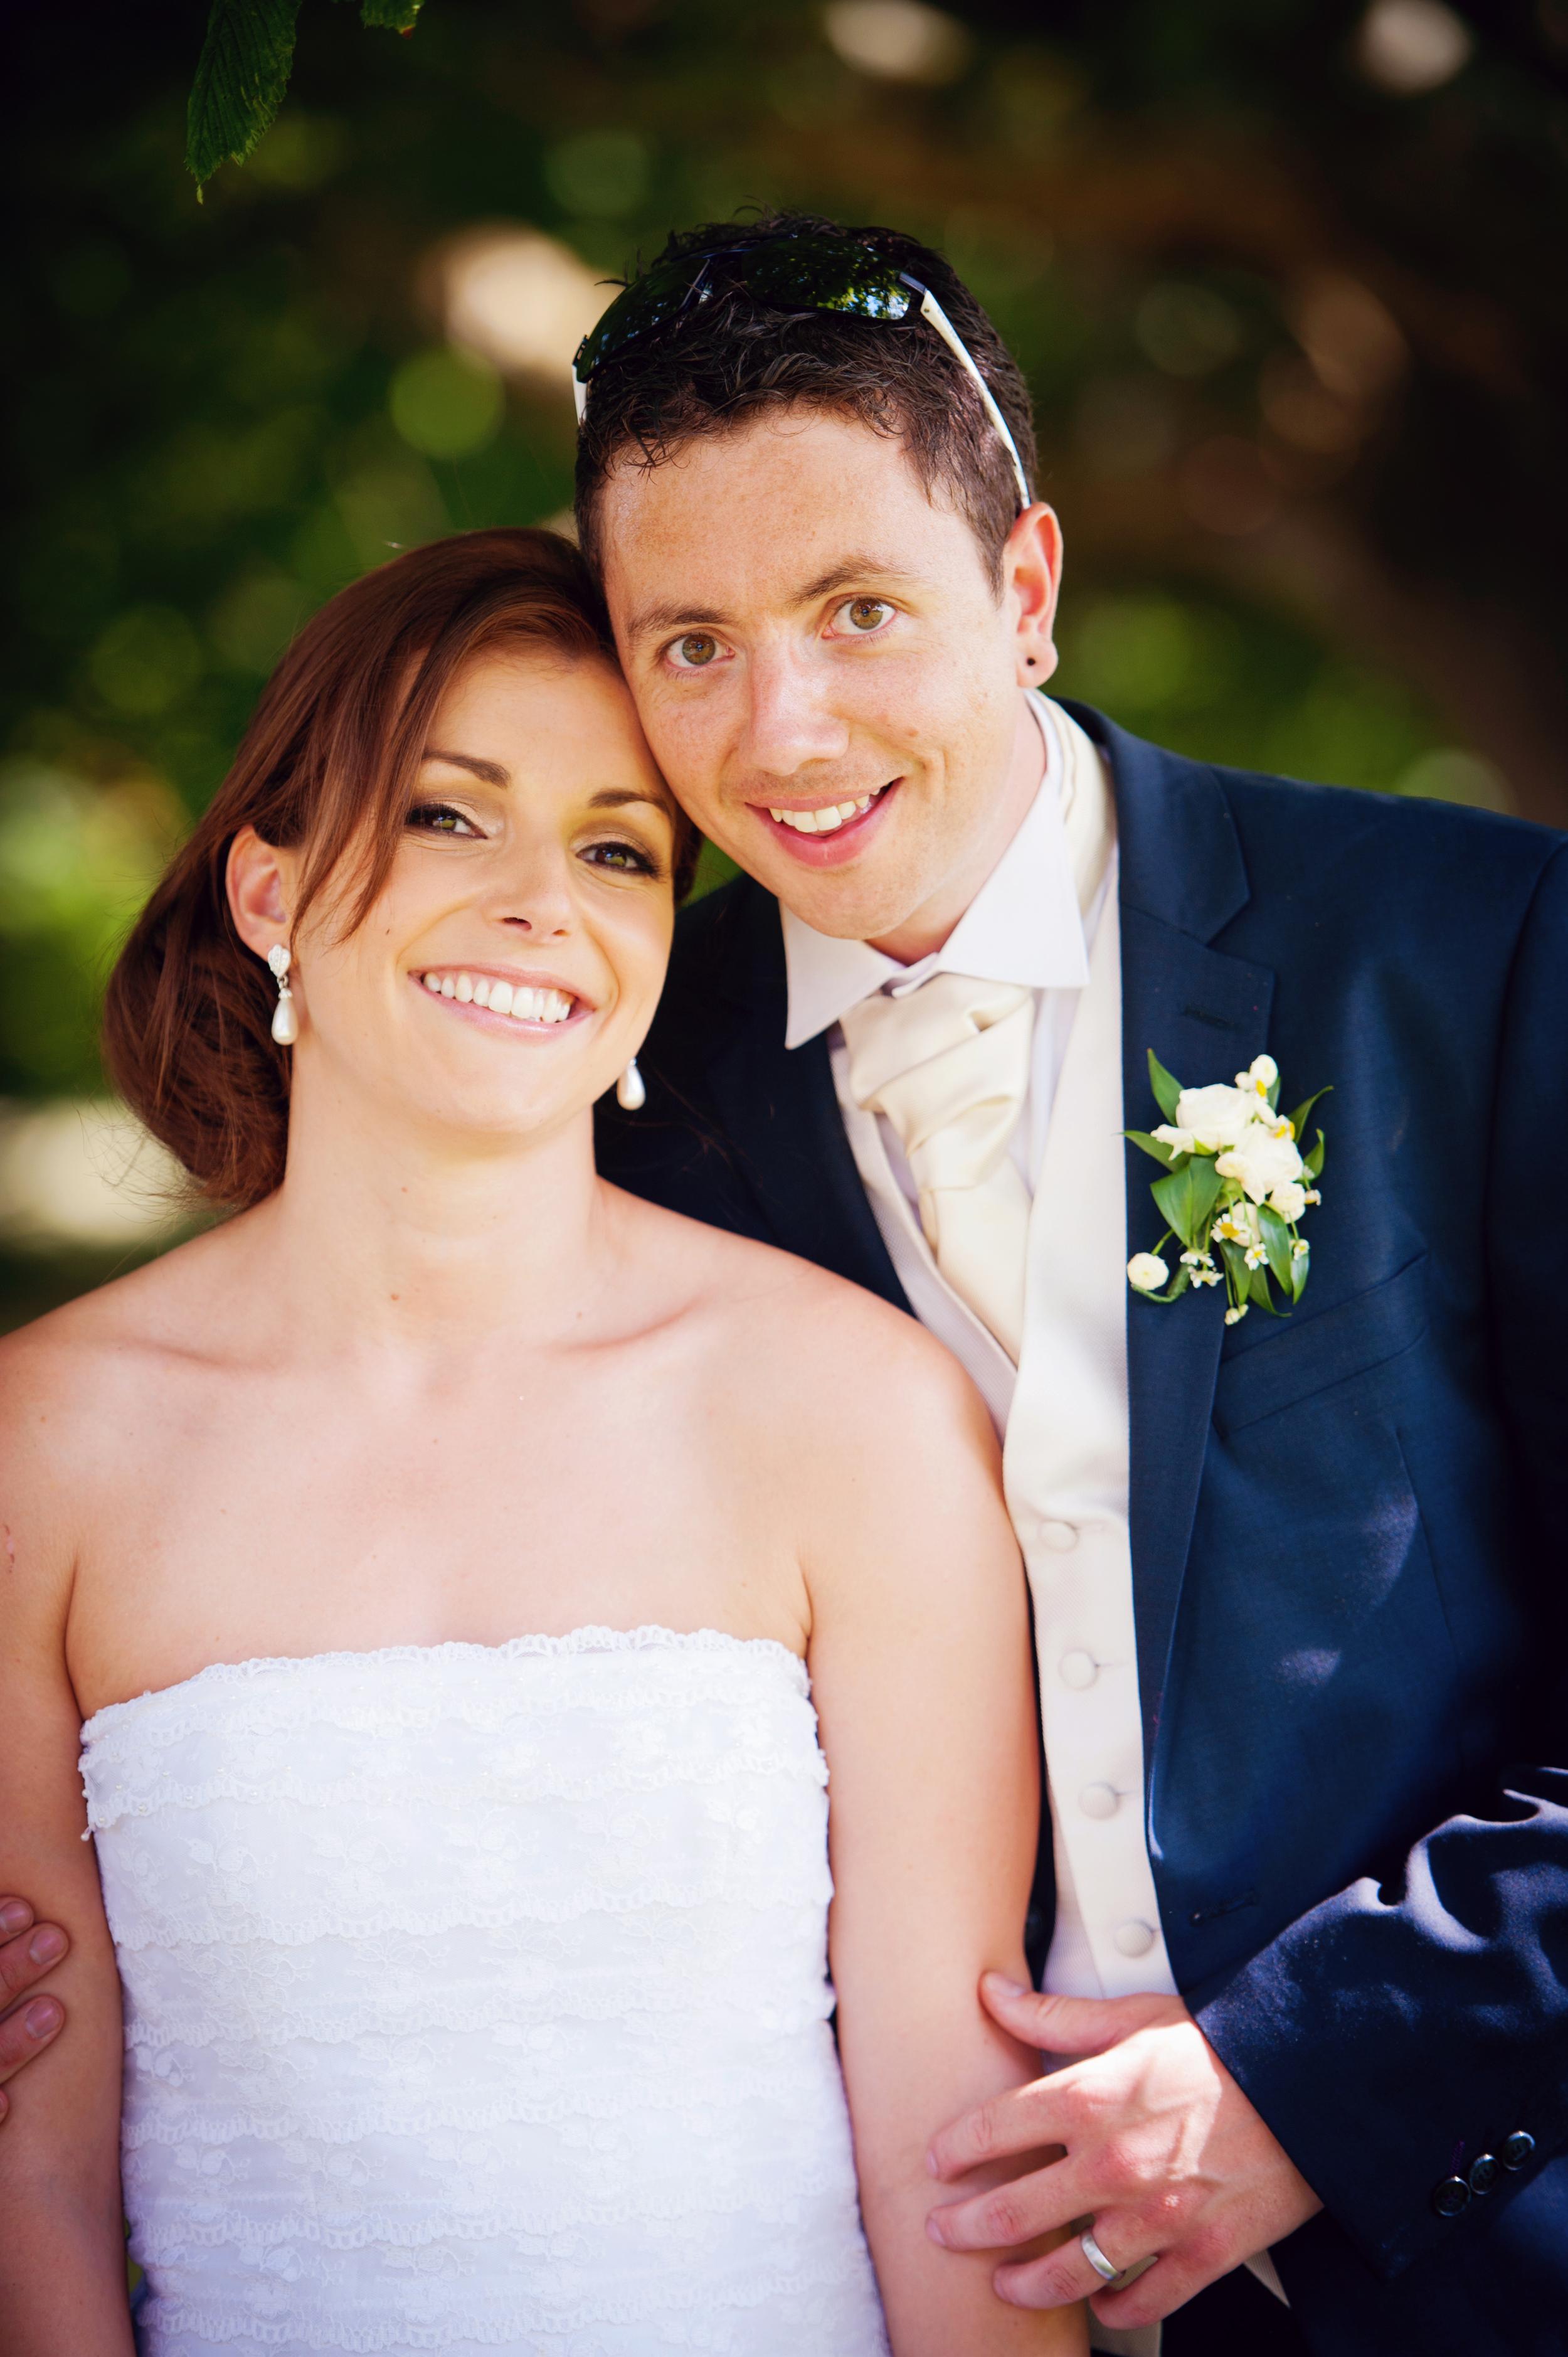 Photography:  Weddings by KARA  © - Wedding Location: Kilshane House, Tipperary, Ireland